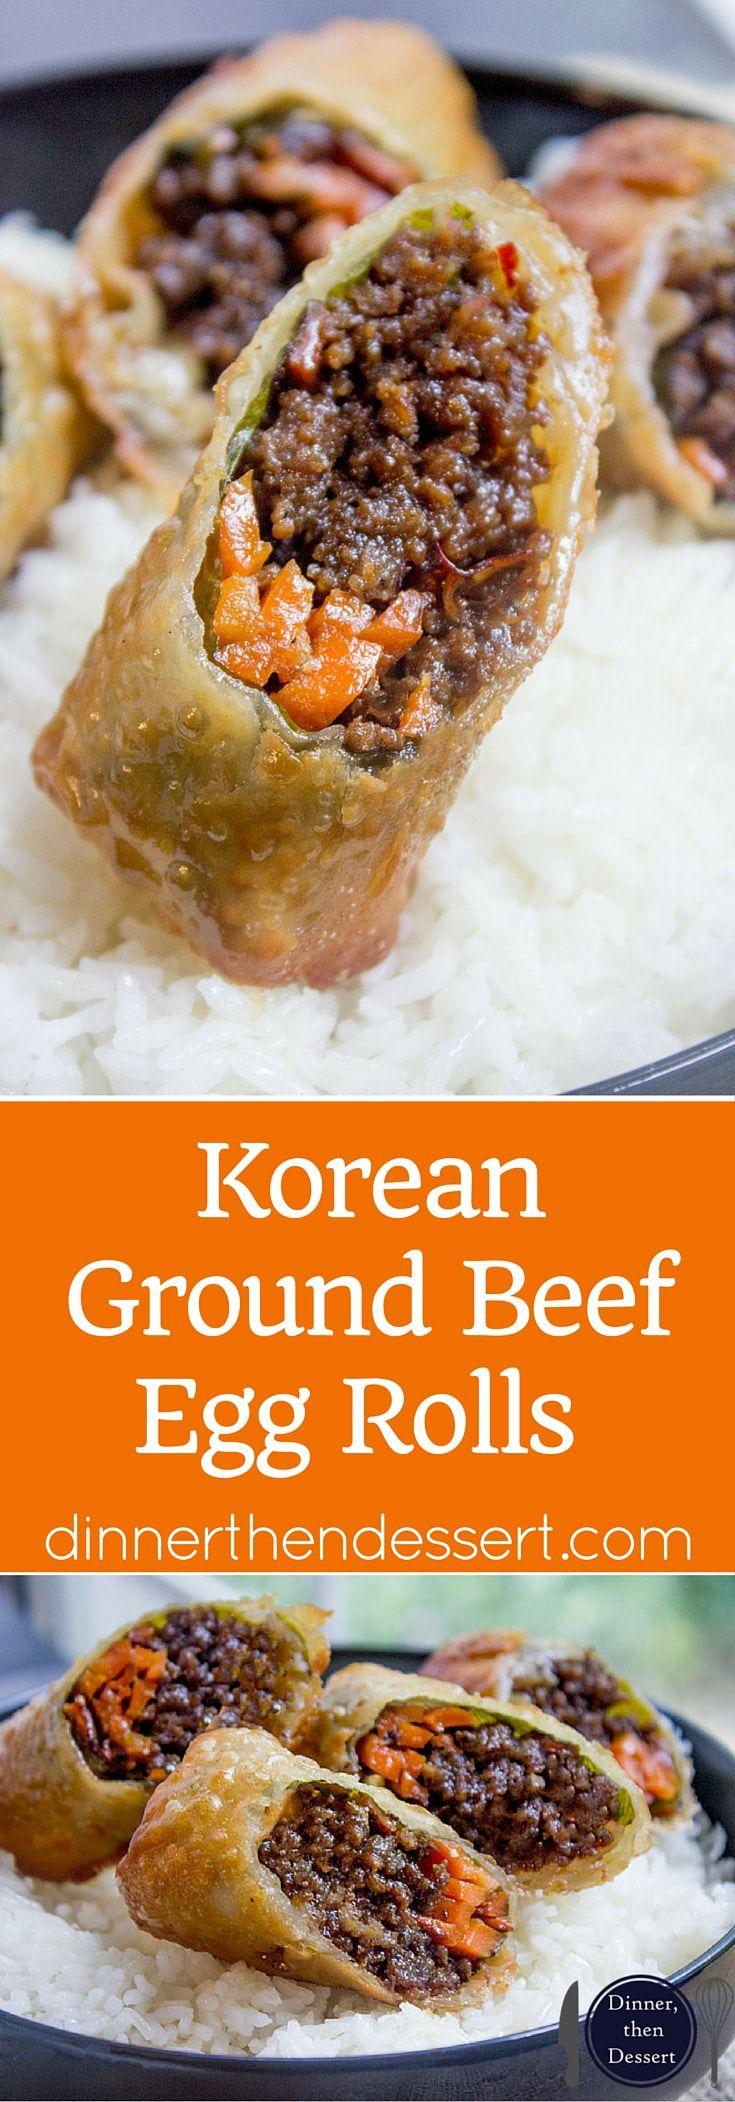 Korean Ground Beef Egg Rolls Appetizer Recipes Beef Recipes Recipes